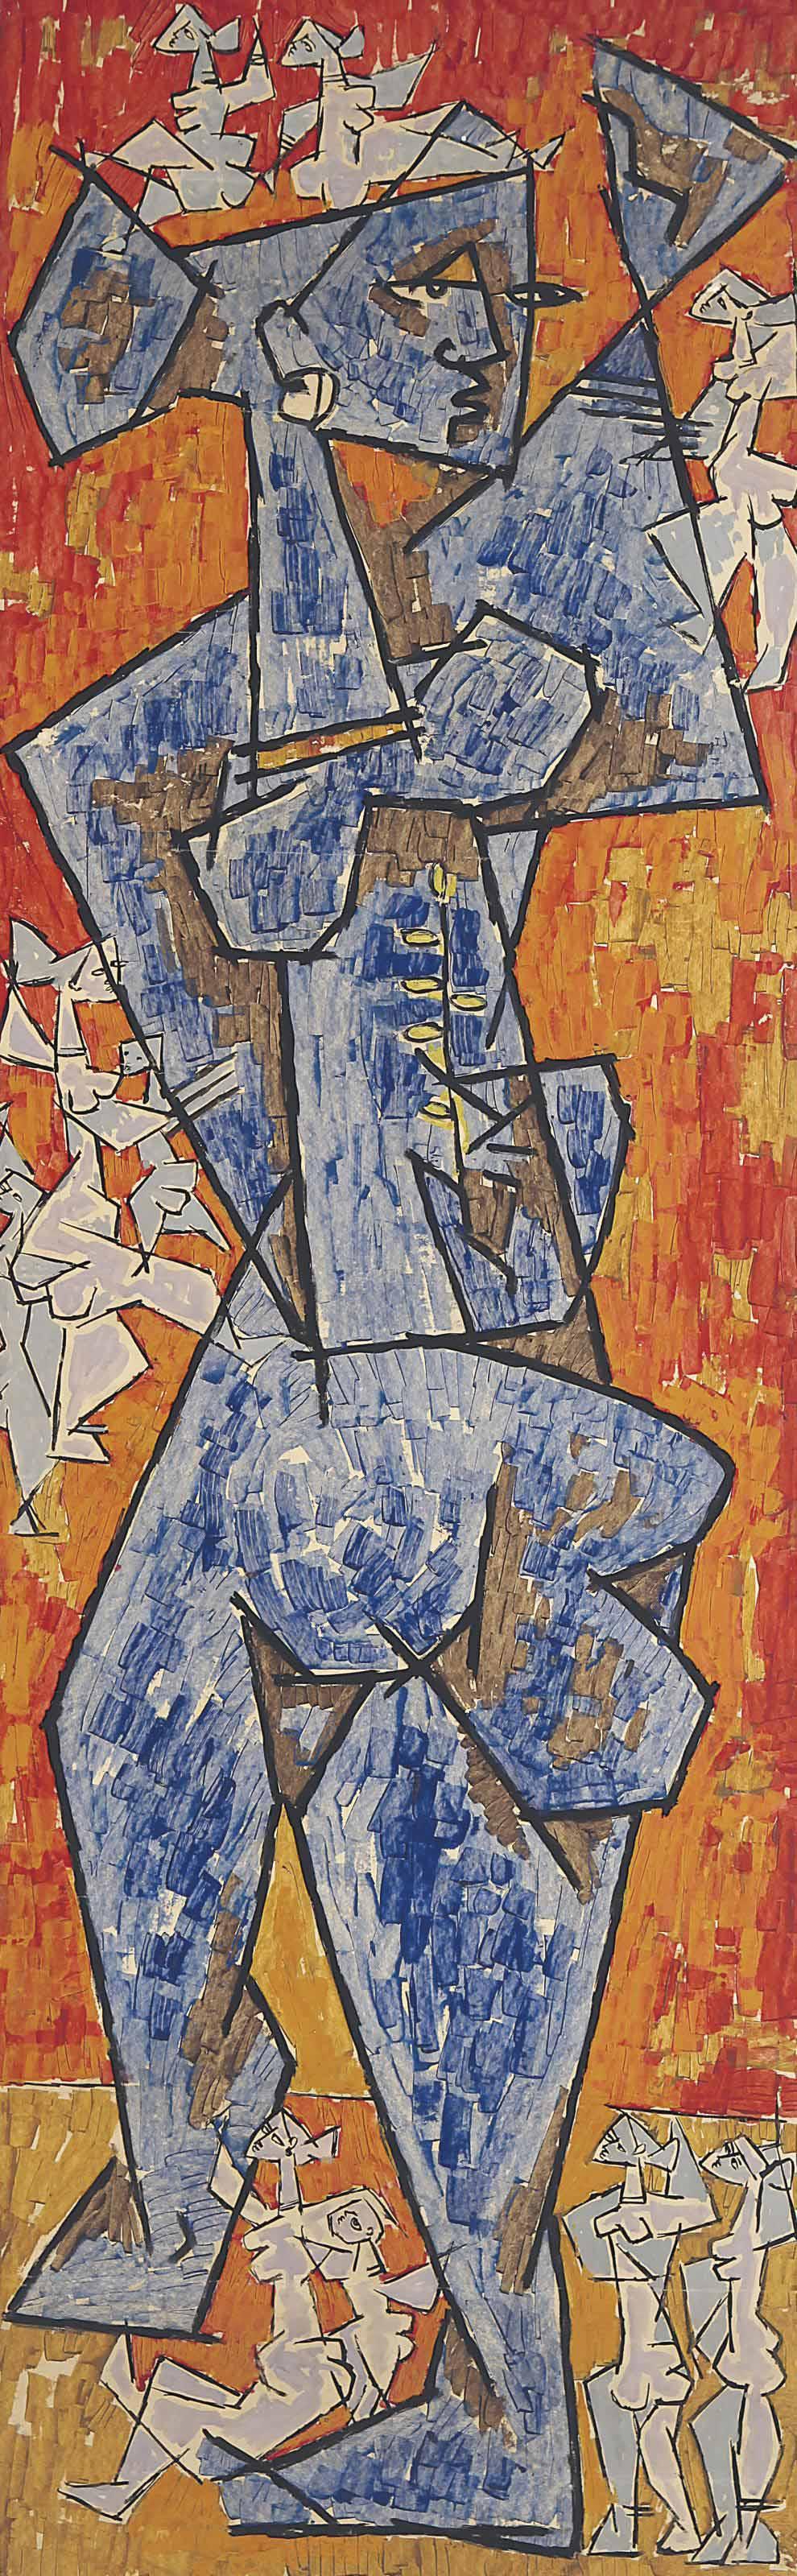 GULAM RASOOL SANTOSH (1929-1997)